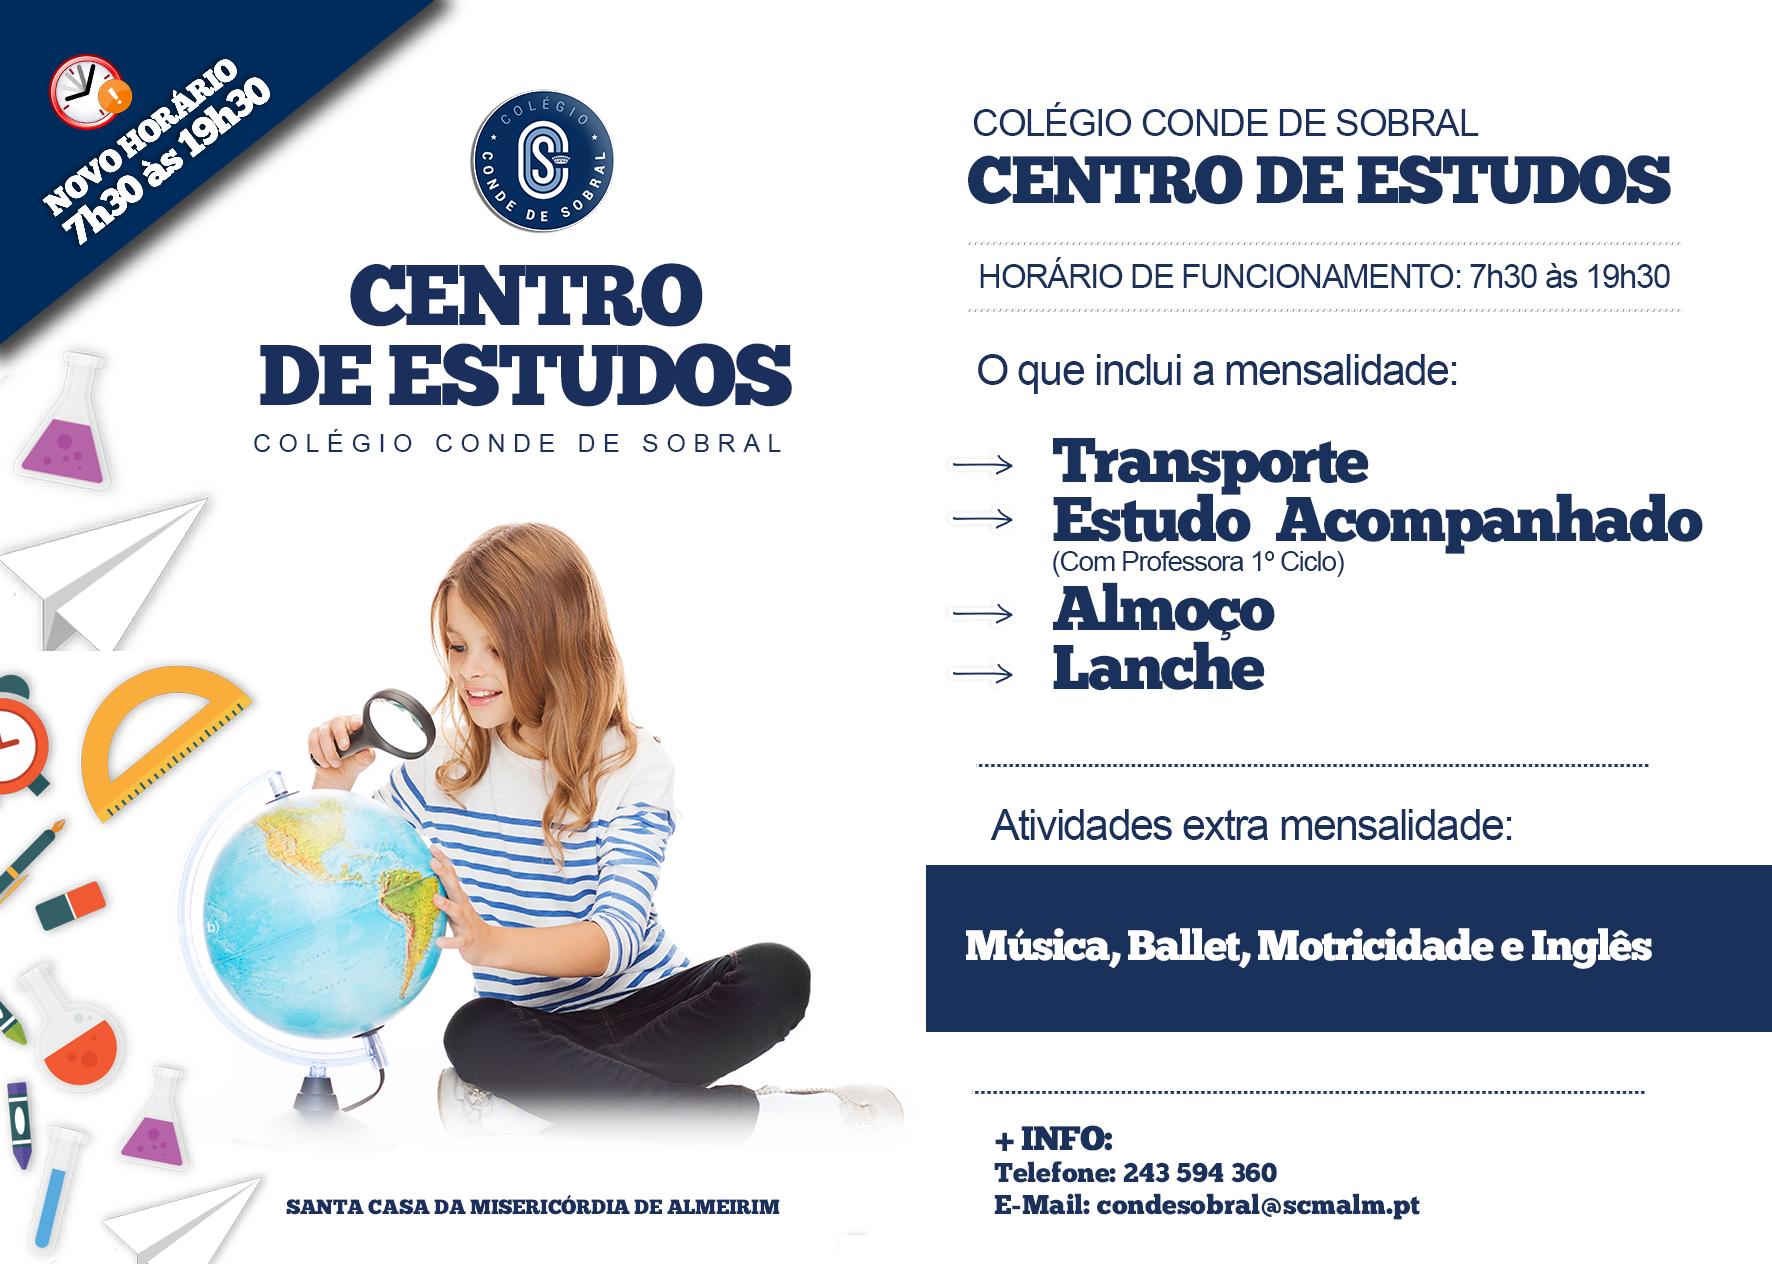 Centro de Estudos – C. Conde de Sobral